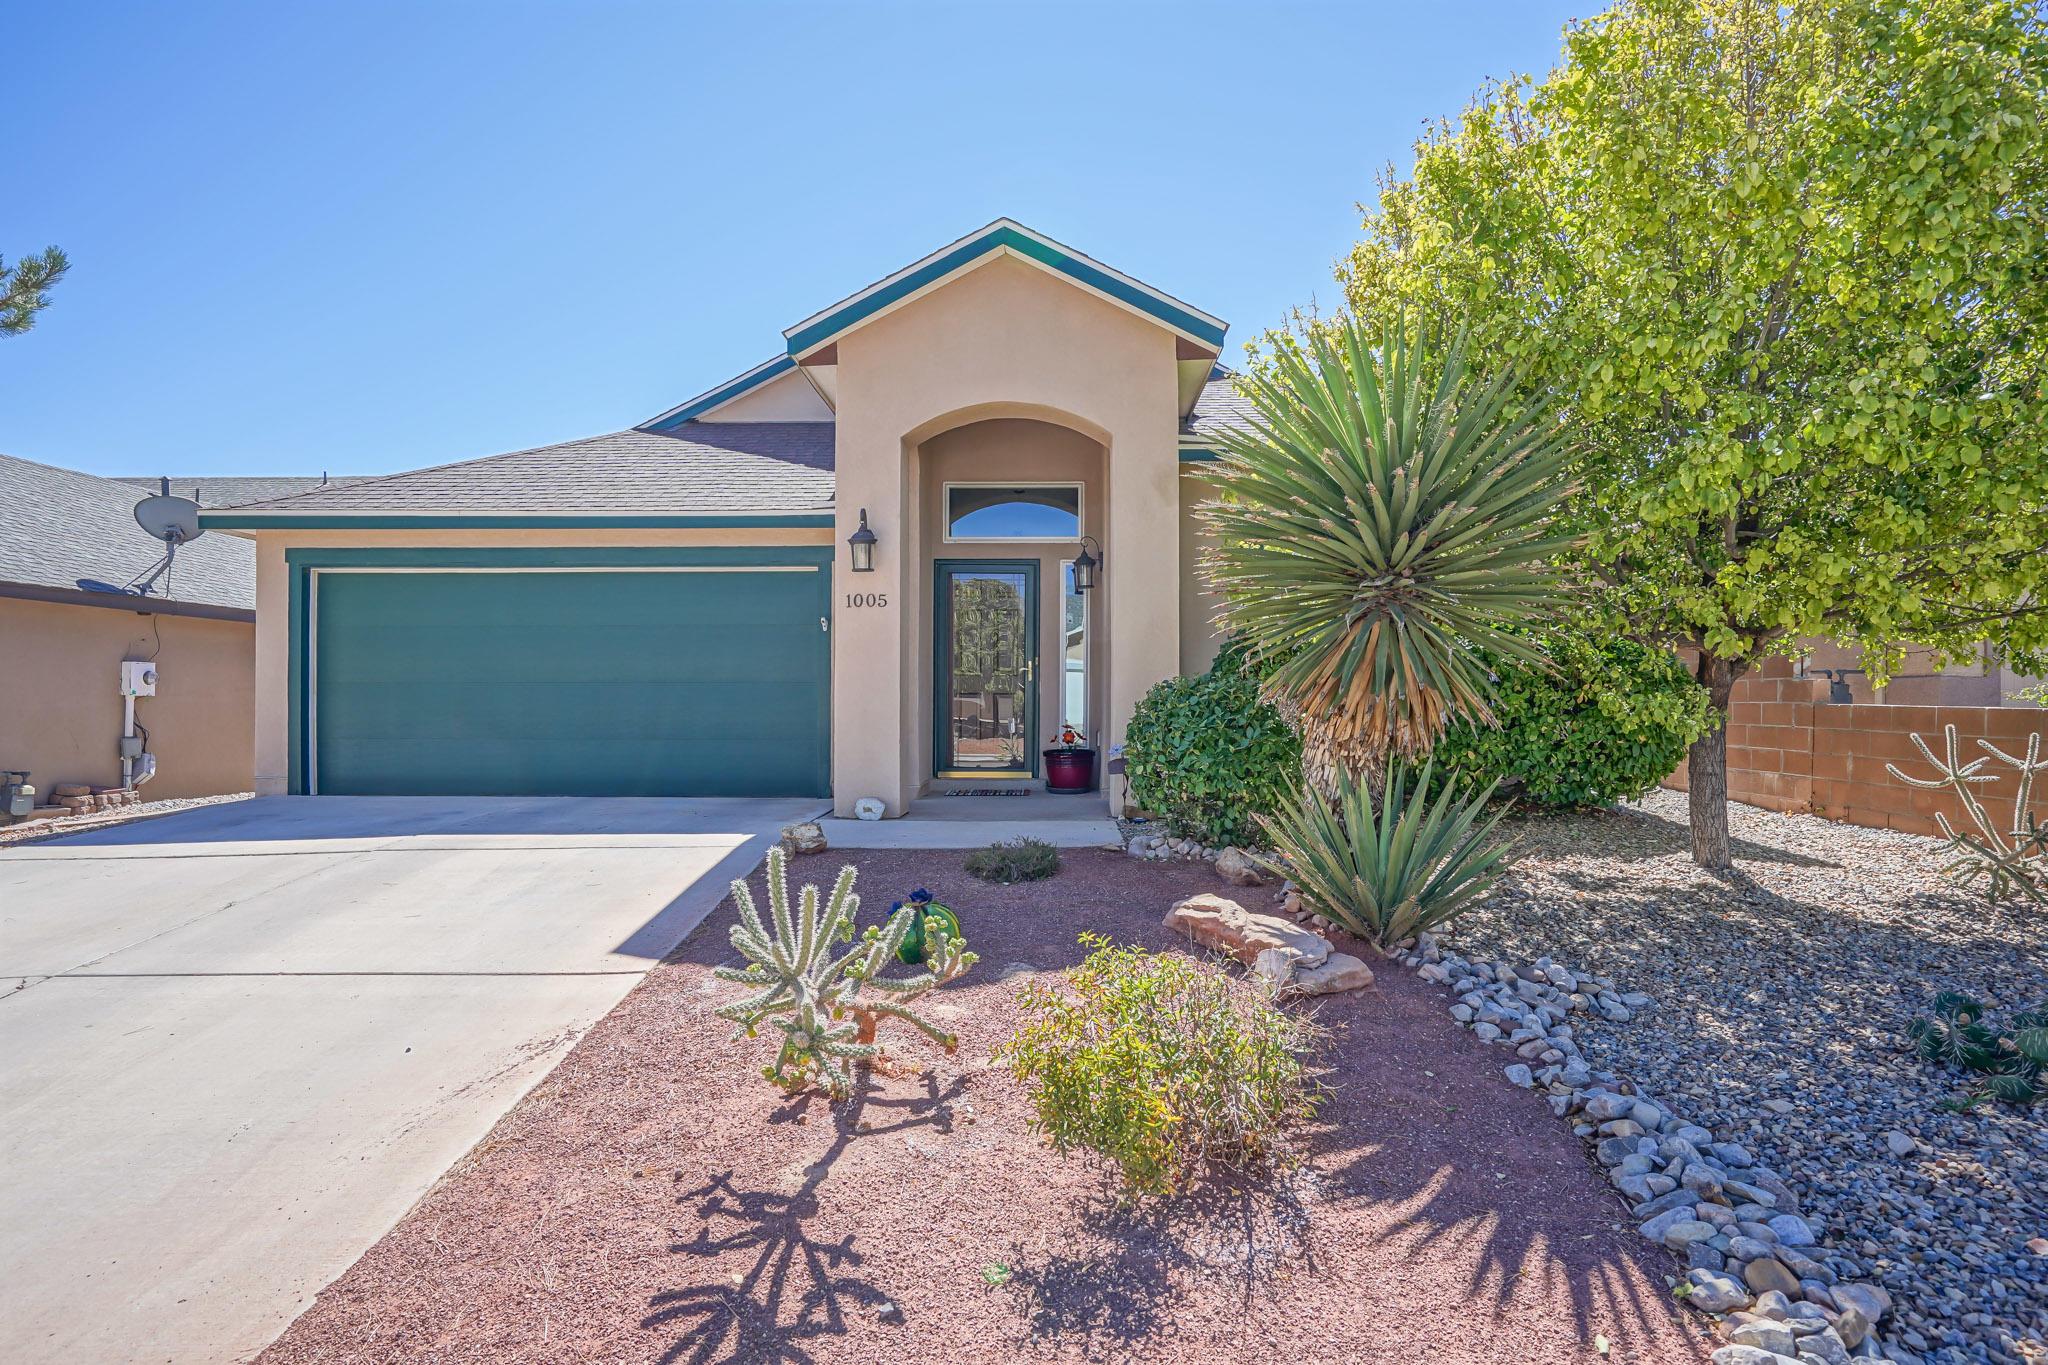 1005 REYNOSA Loop SE Property Photo - Rio Rancho, NM real estate listing